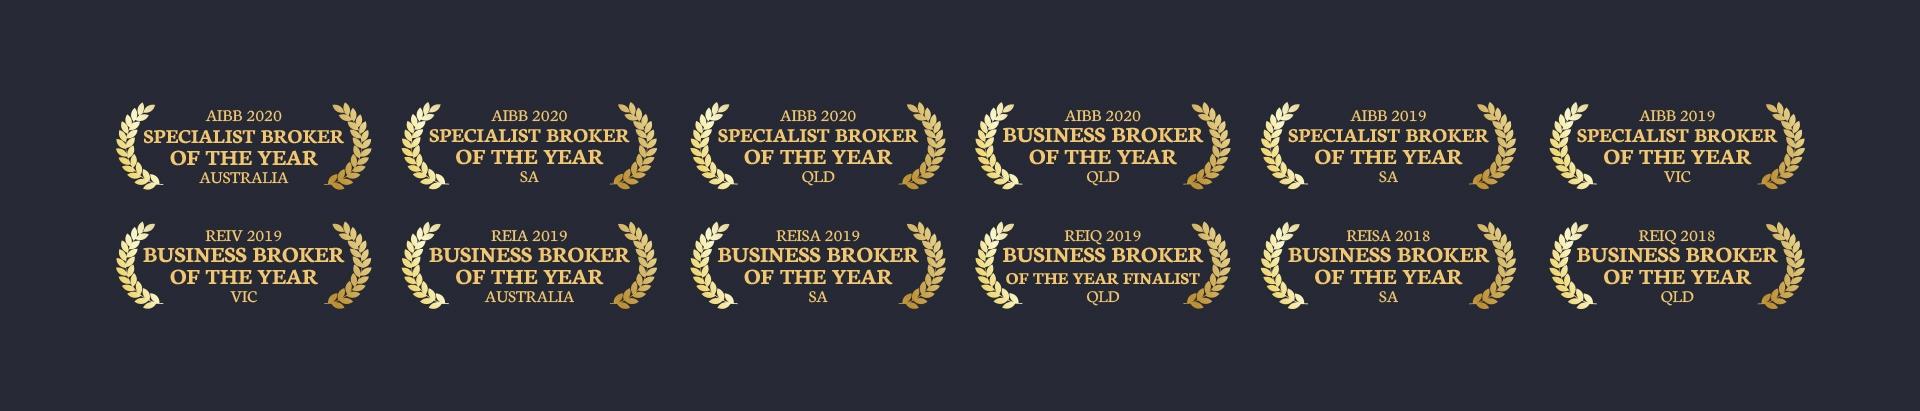 Salon Sales Australia Award Winning Brokers